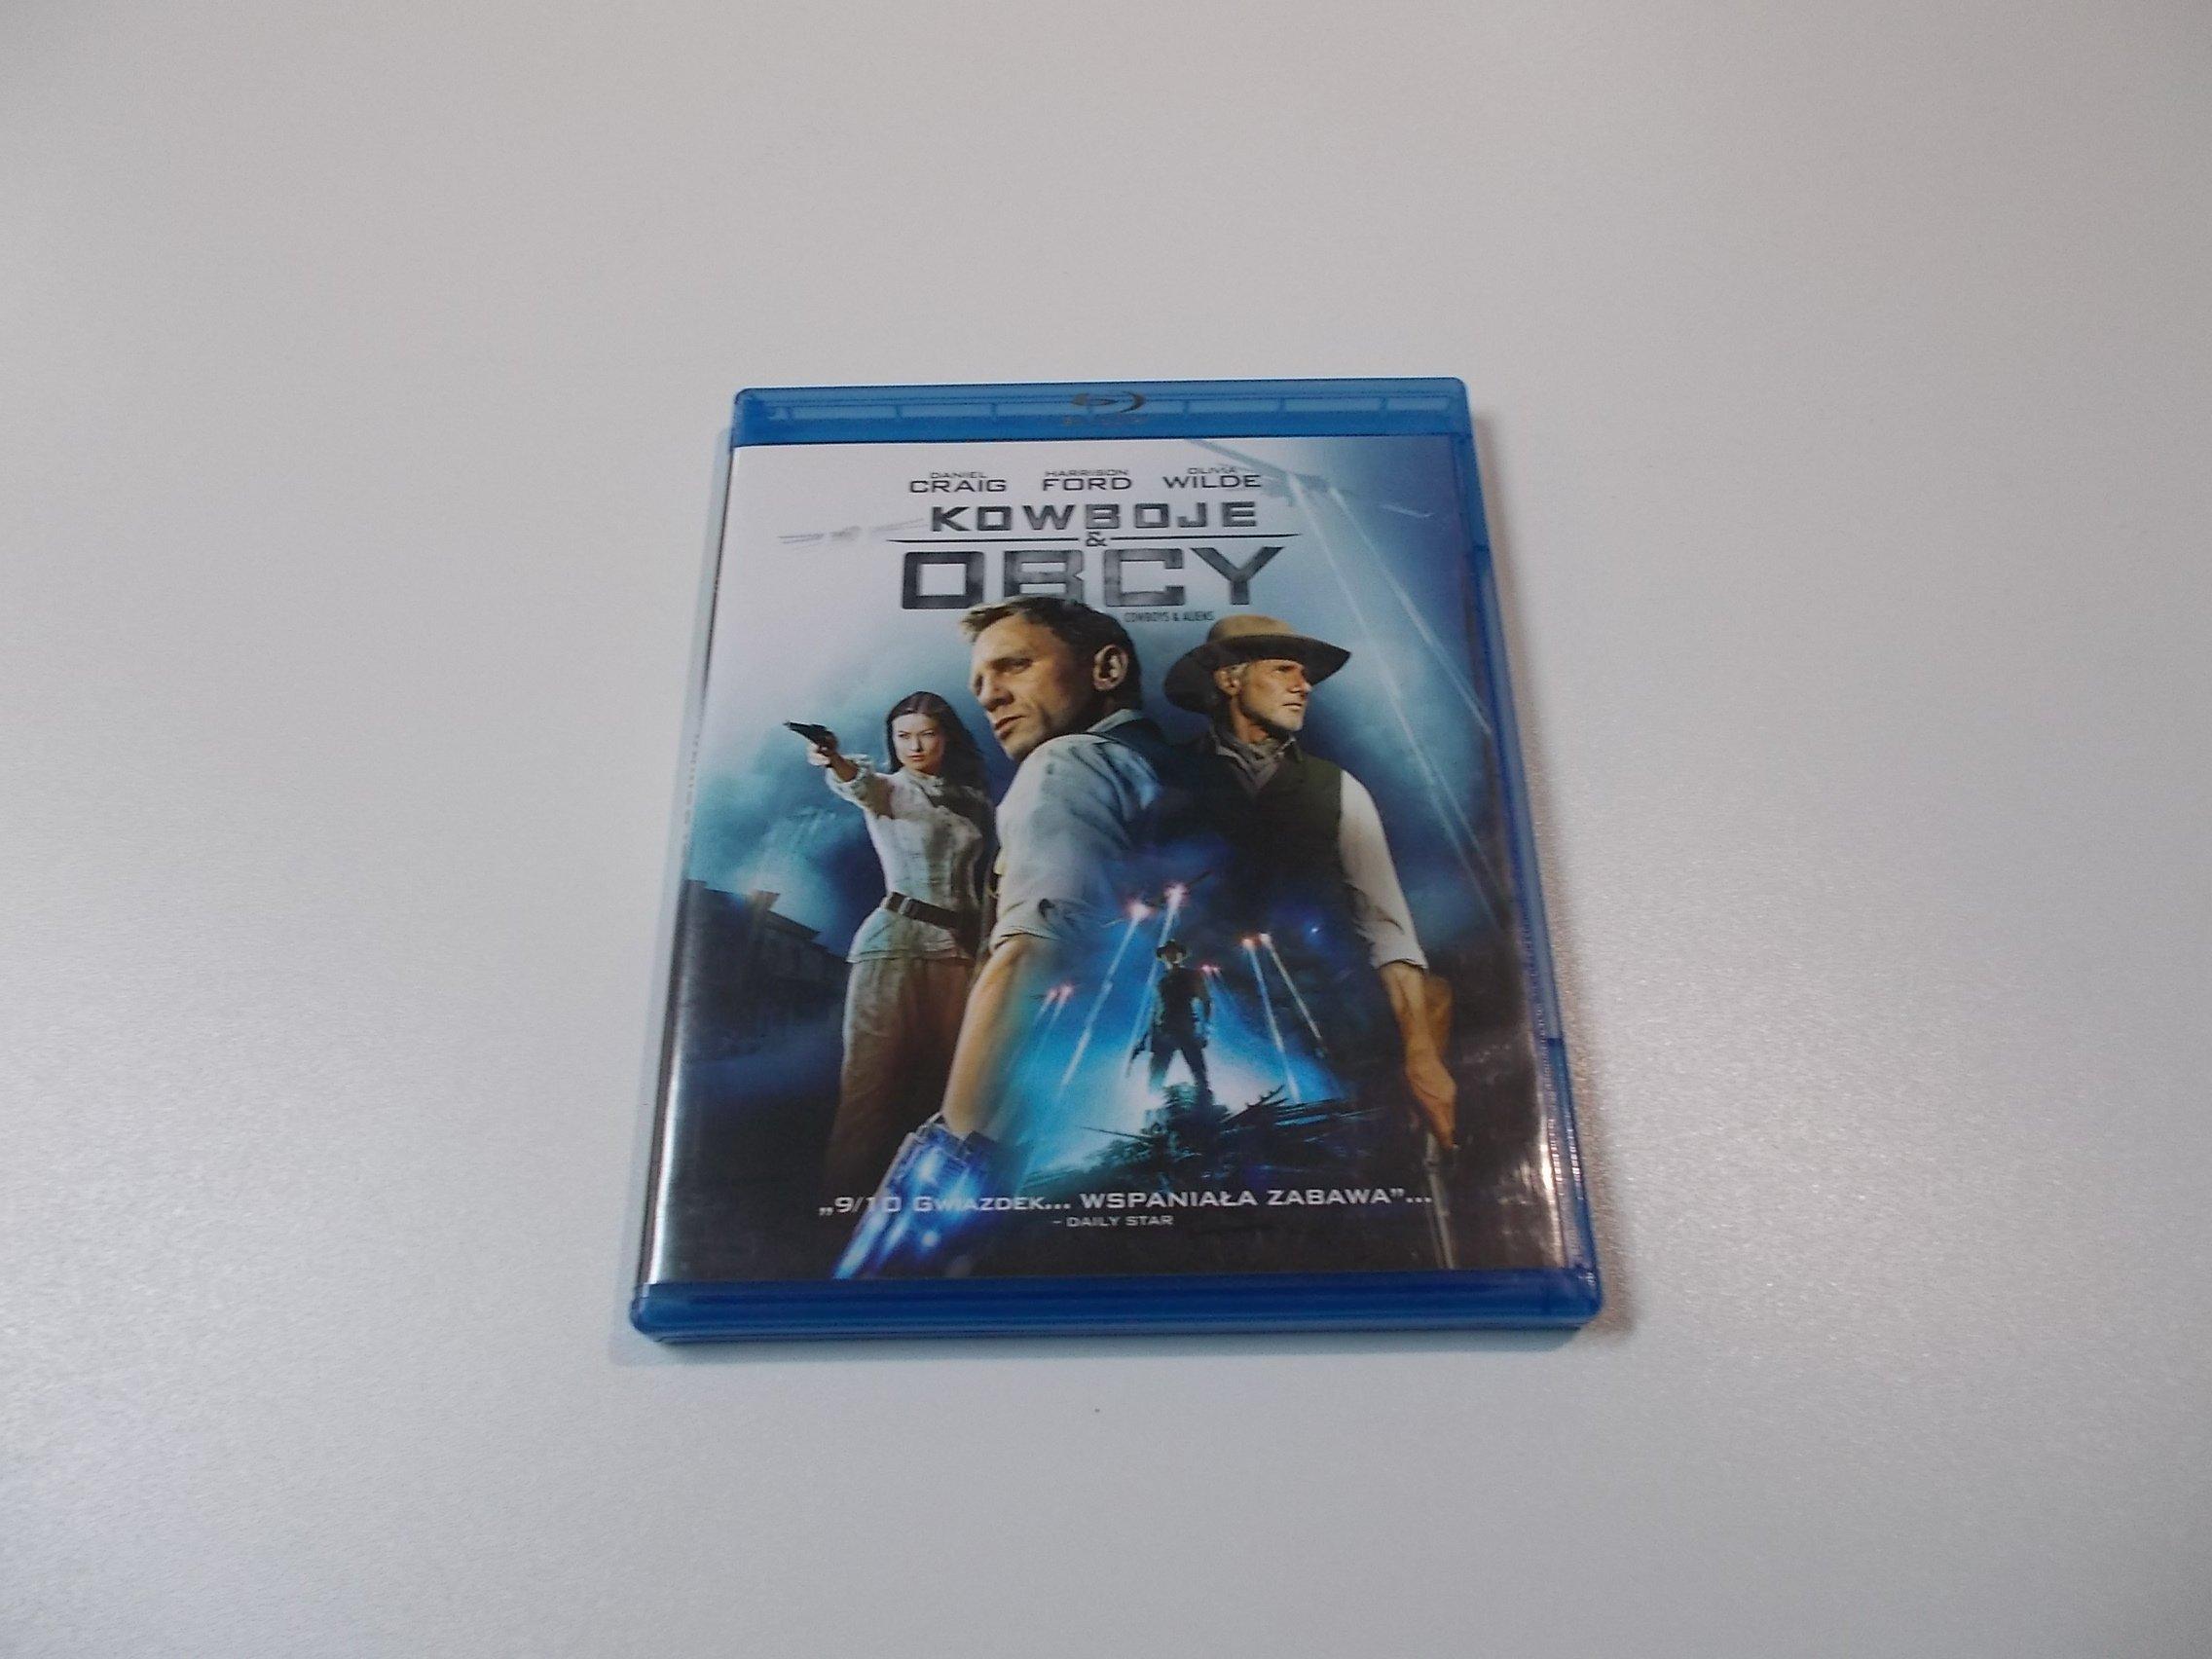 KOWBOJE I OBCY - Blu-ray - Sklep